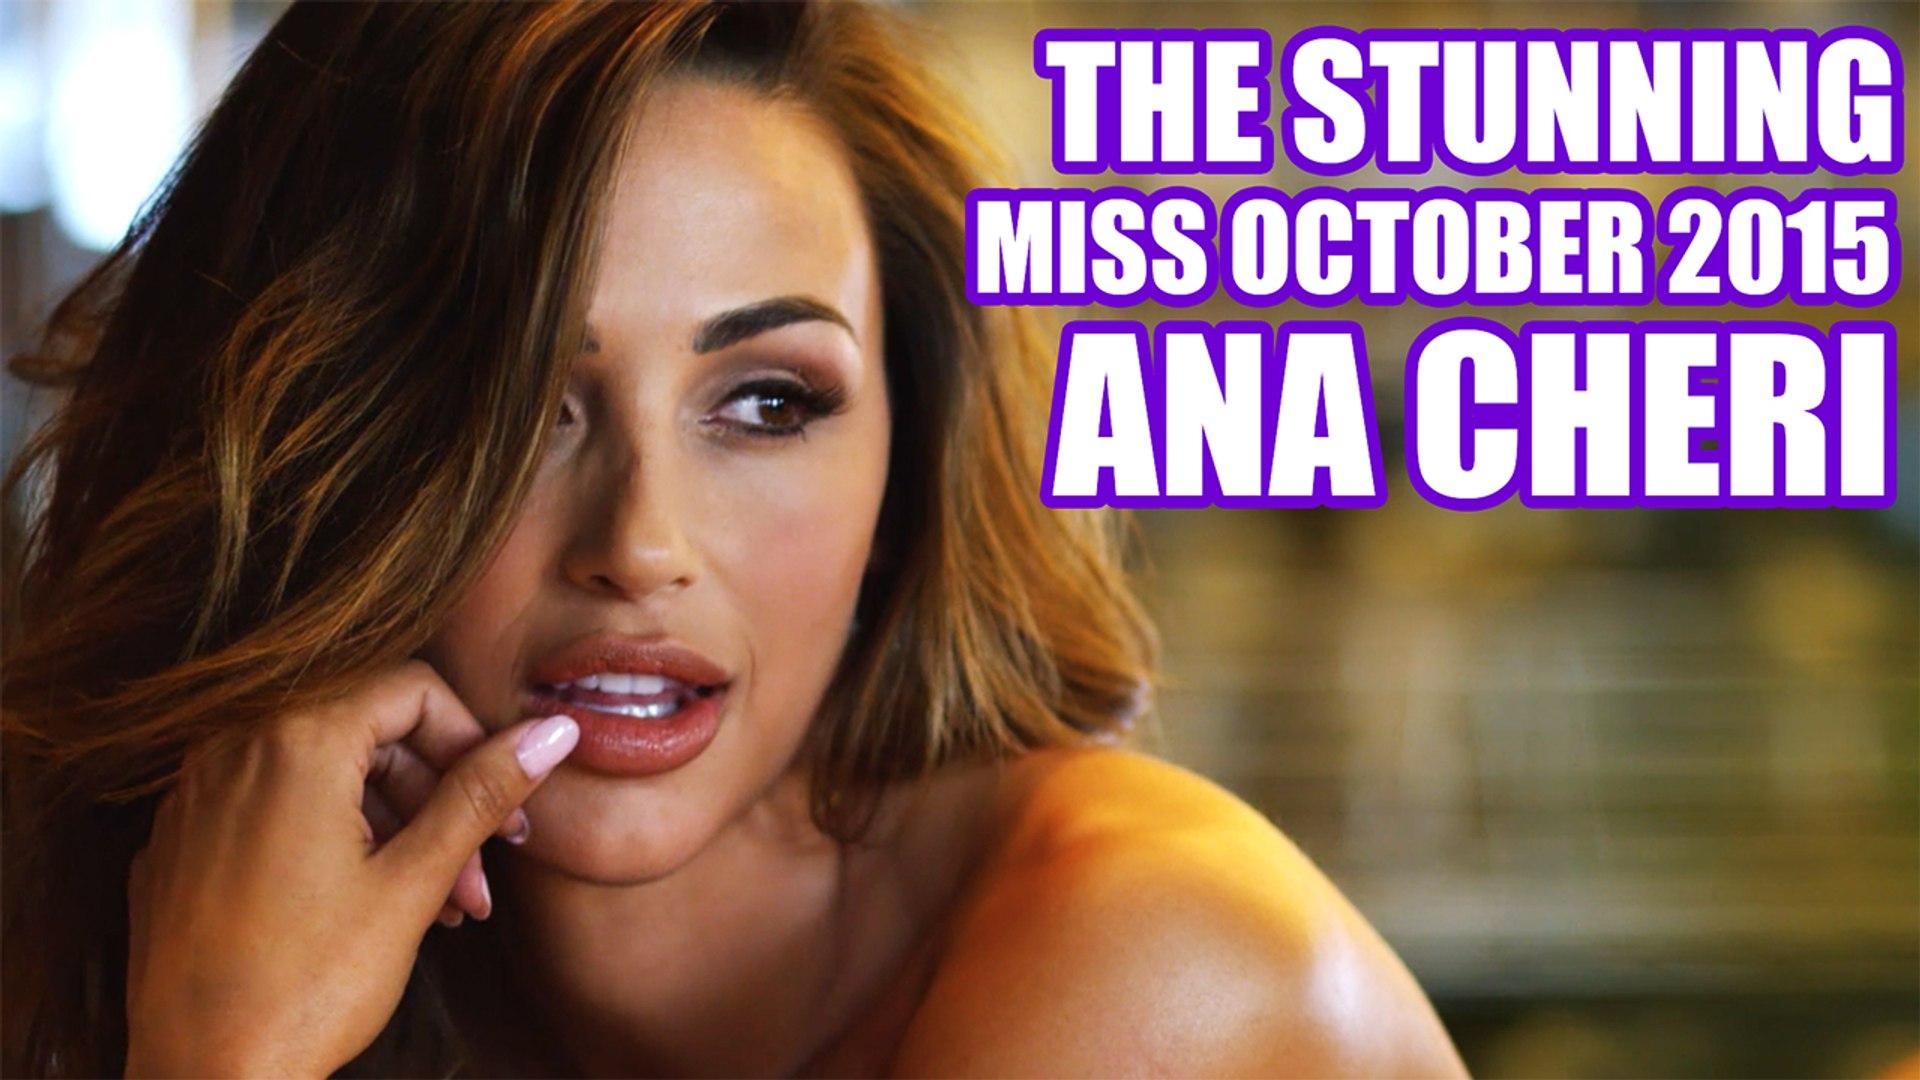 Ana Cheri Playboy behind the scenes of miss october 2015 ana cheri - playboy